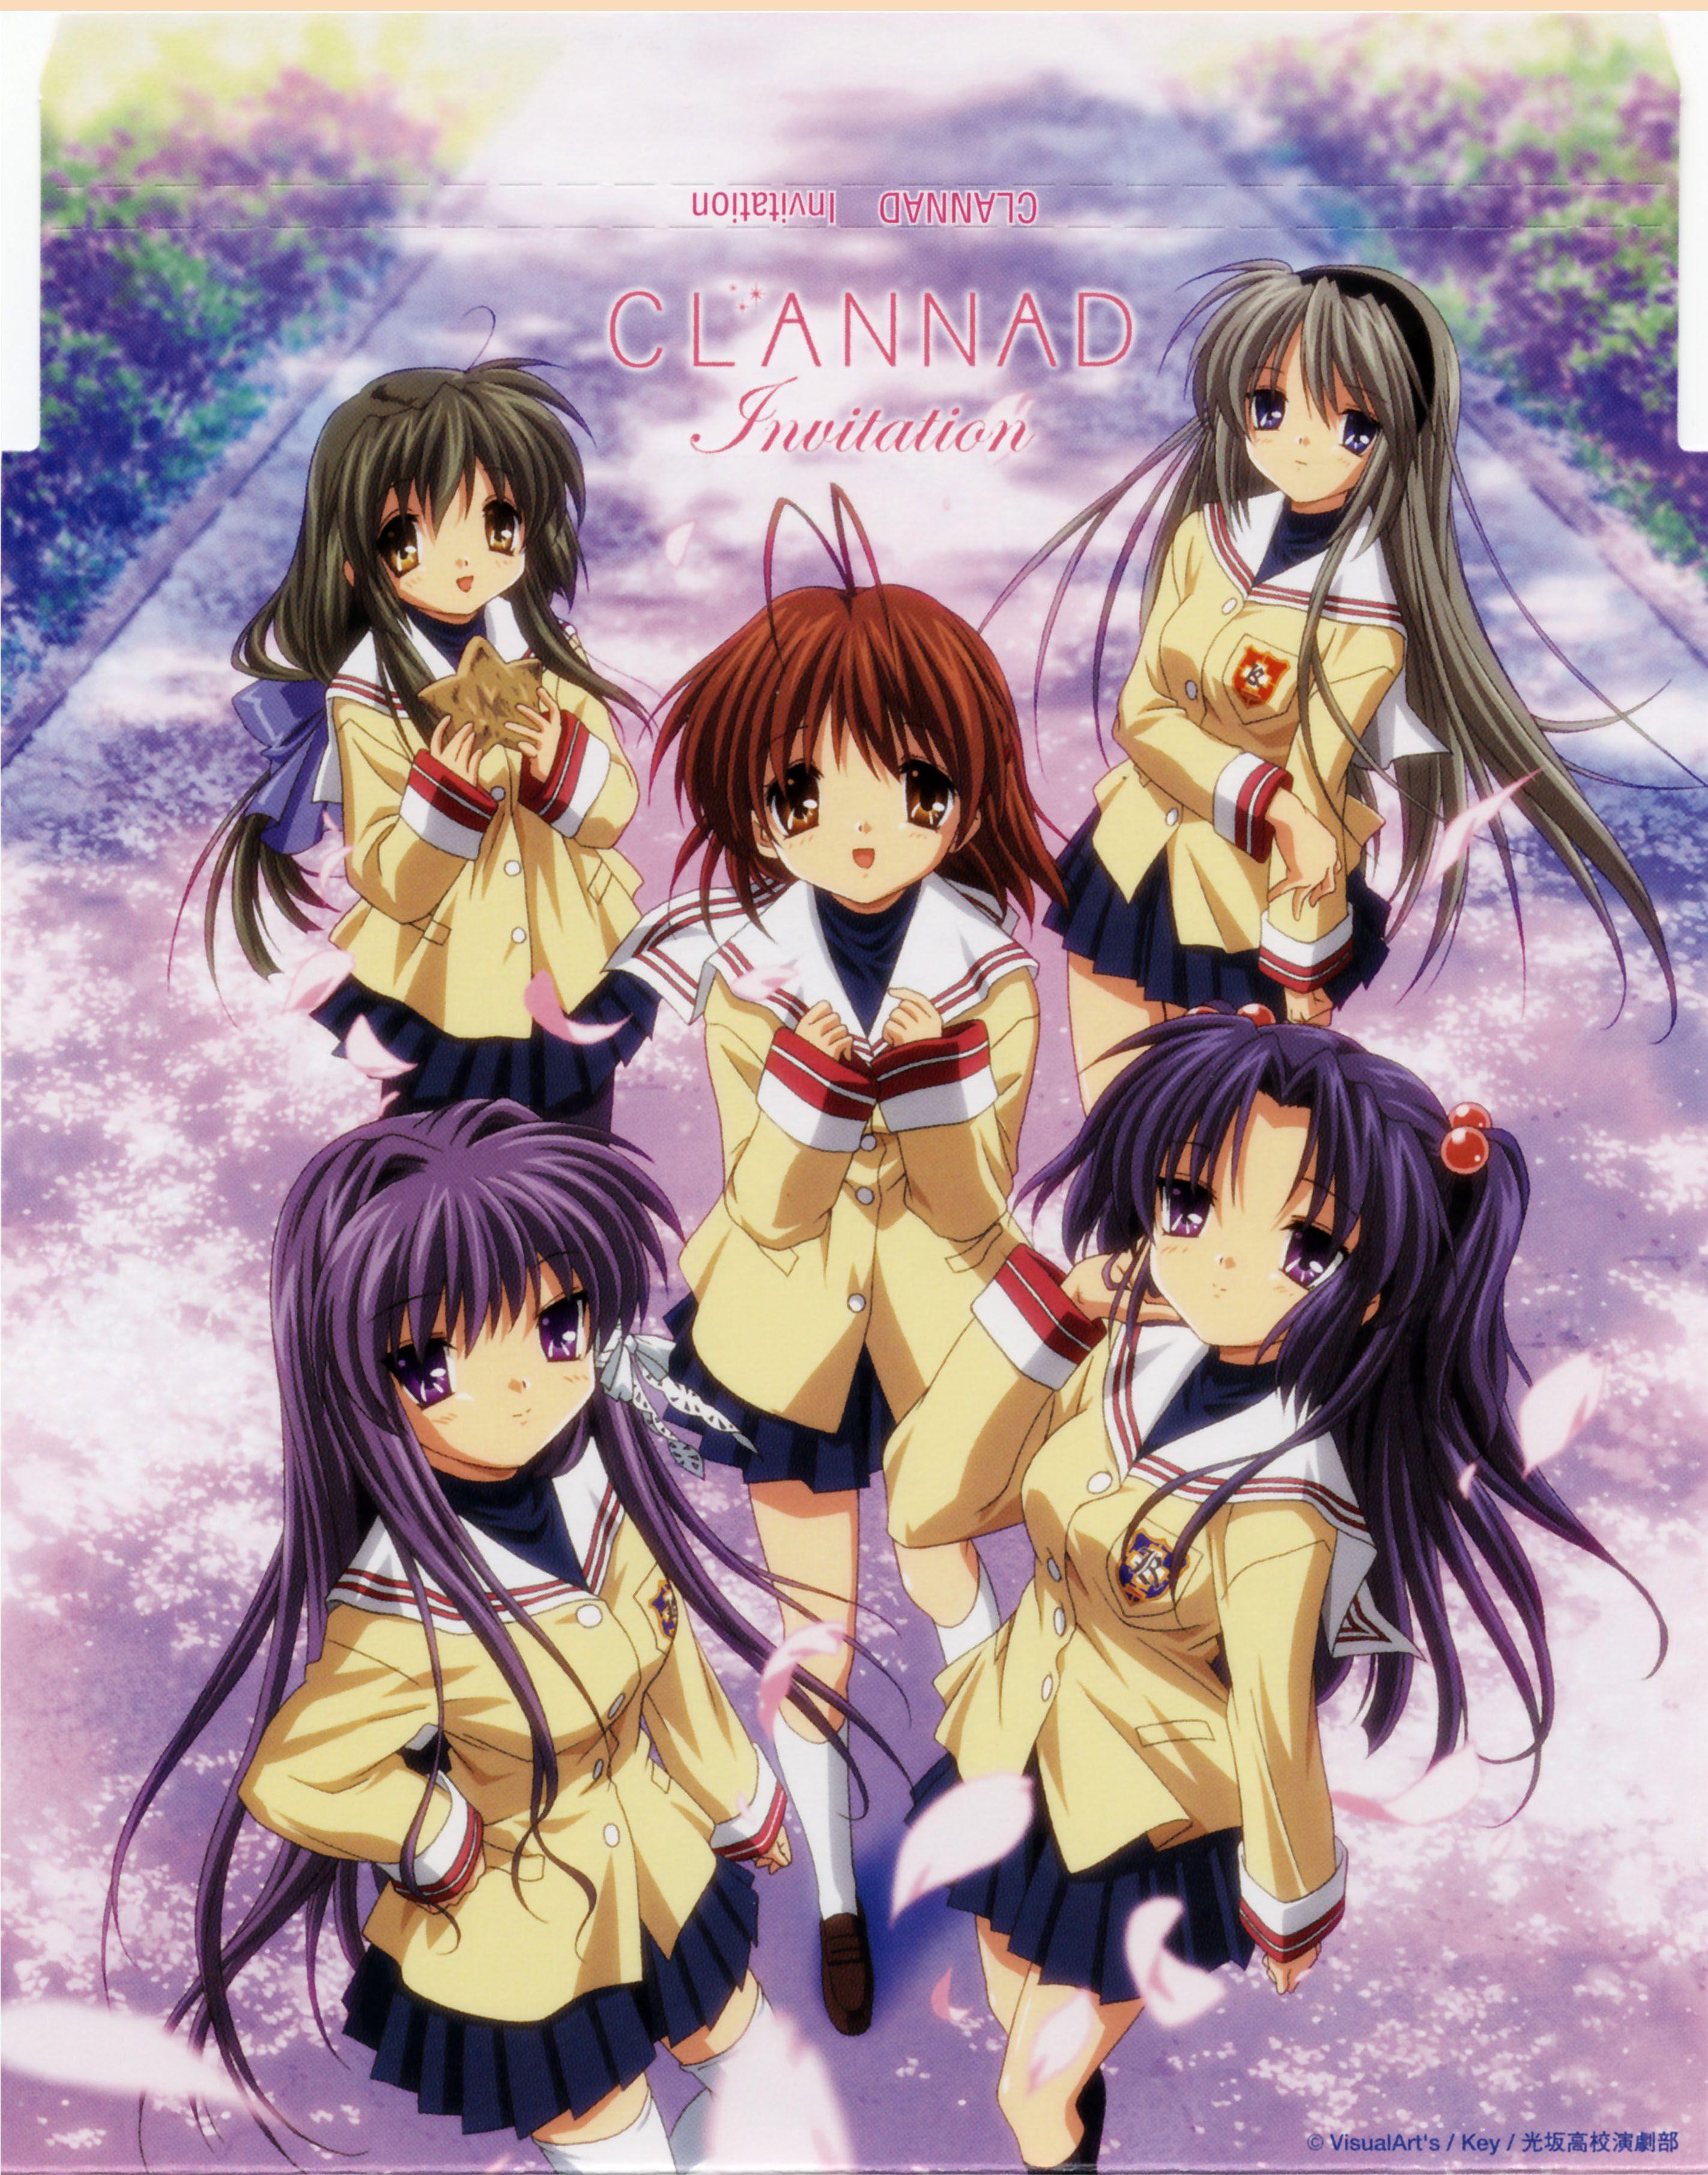 CLANNAD Invitation DVD Clannad anime, Clannad, Anime dvd